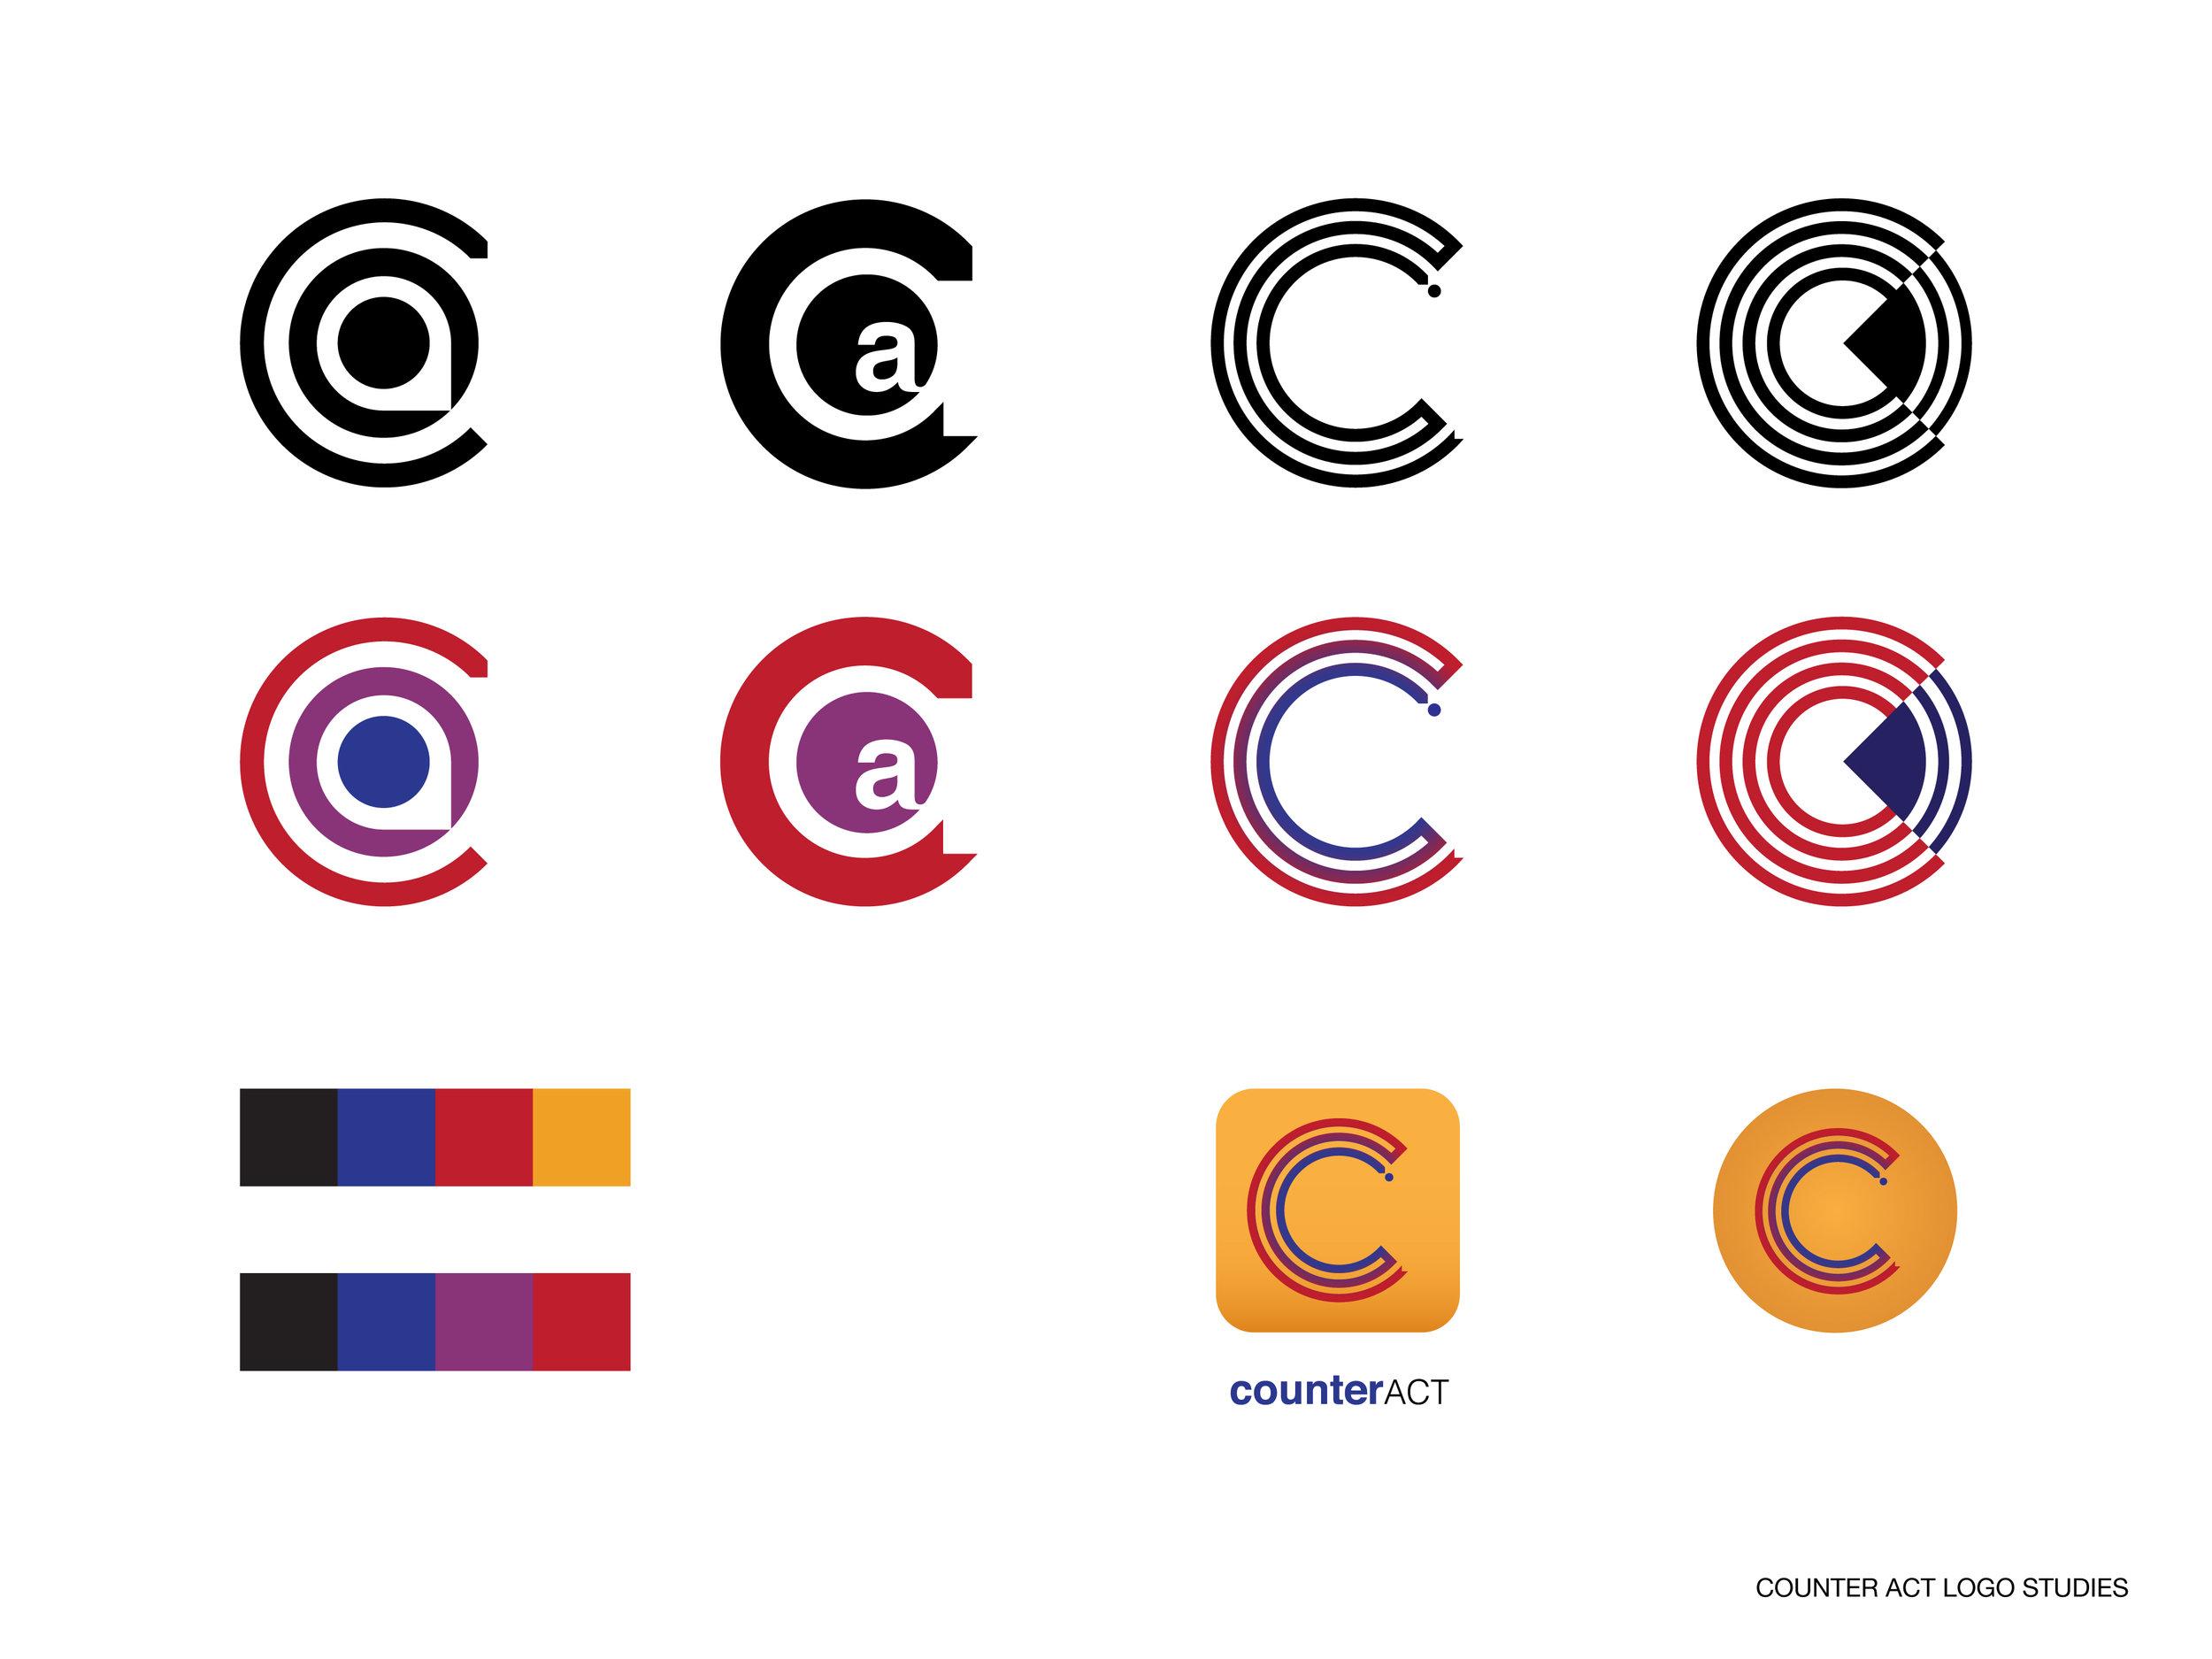 Counter Act Logo Studies